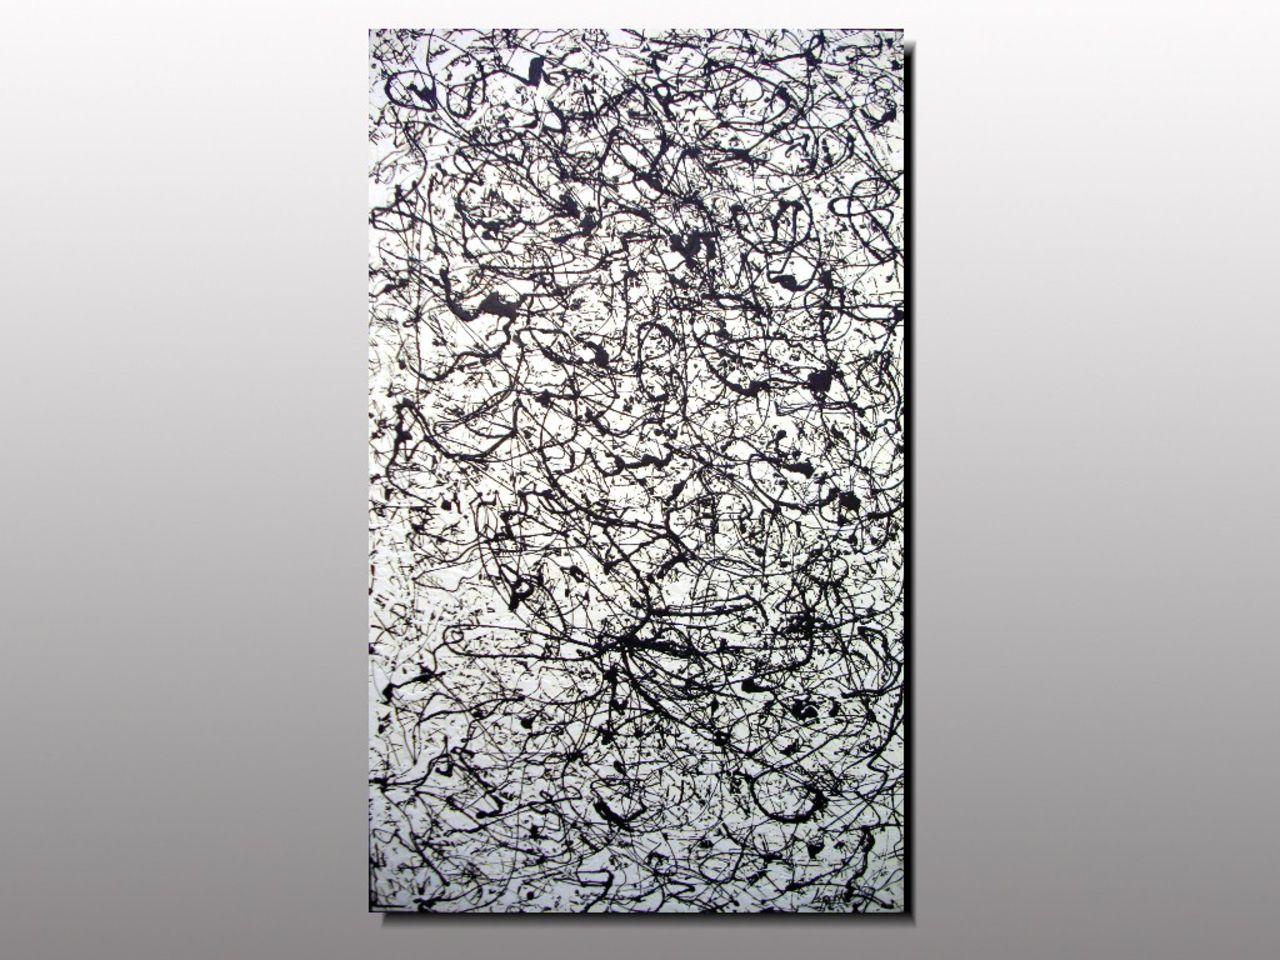 LEPOLSK MATUSZEWSKI MENTOR  Expressionnisme abstrait contemporain